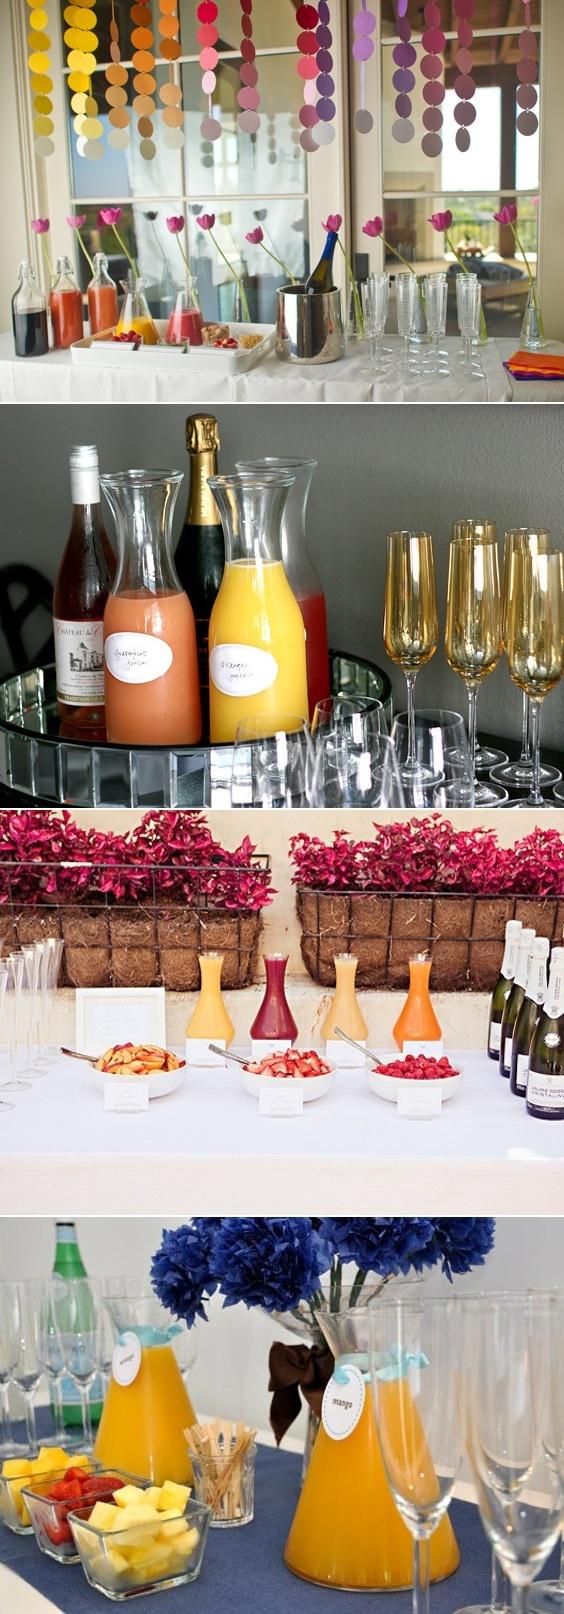 mimosa bar: beautiful setup Peaches, strawberries, raspberries. Love the circles on strings